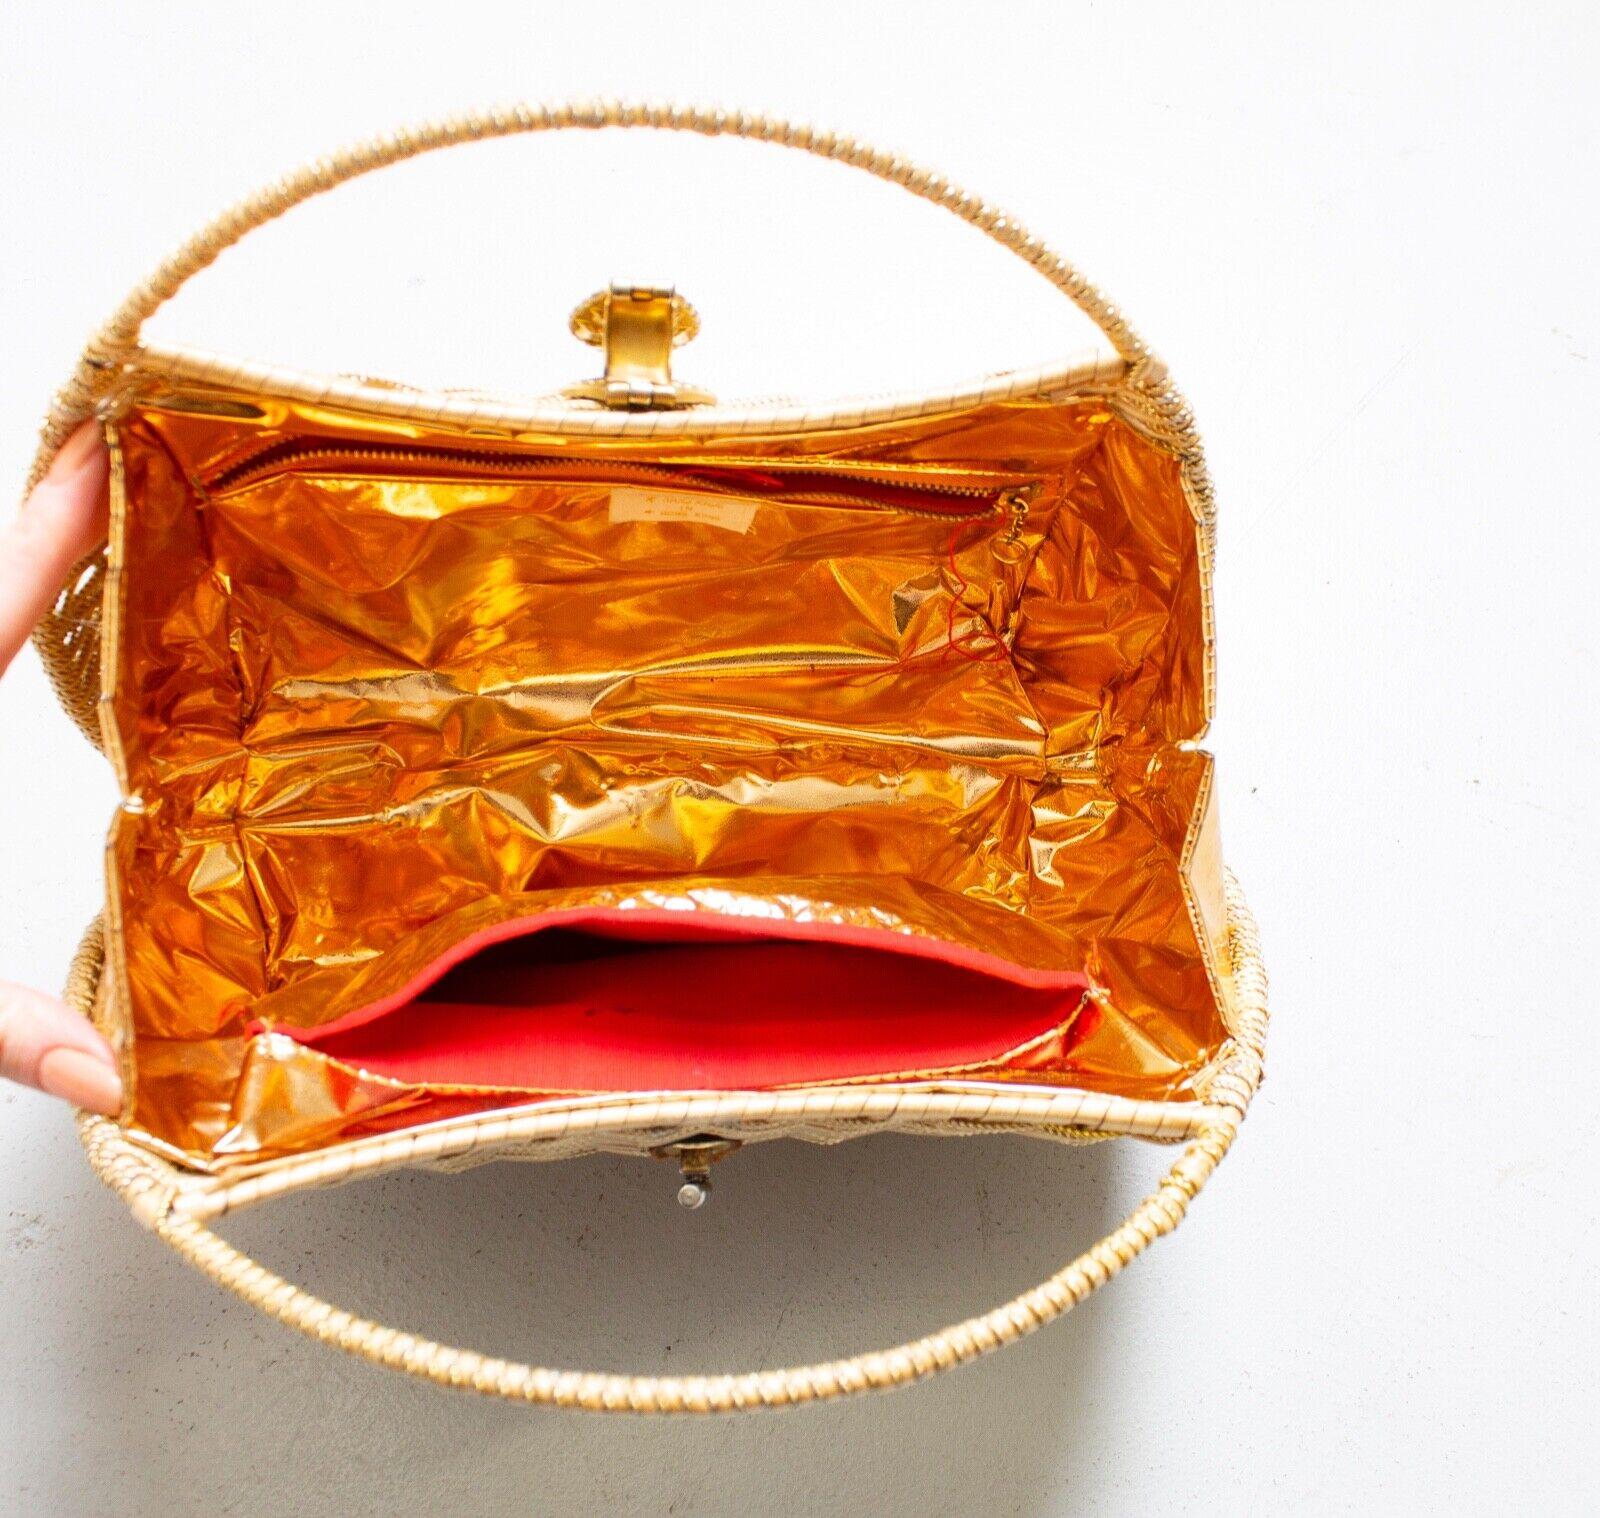 Vintage Basket Purse 1960s Gold Metal Woven Wicke… - image 10